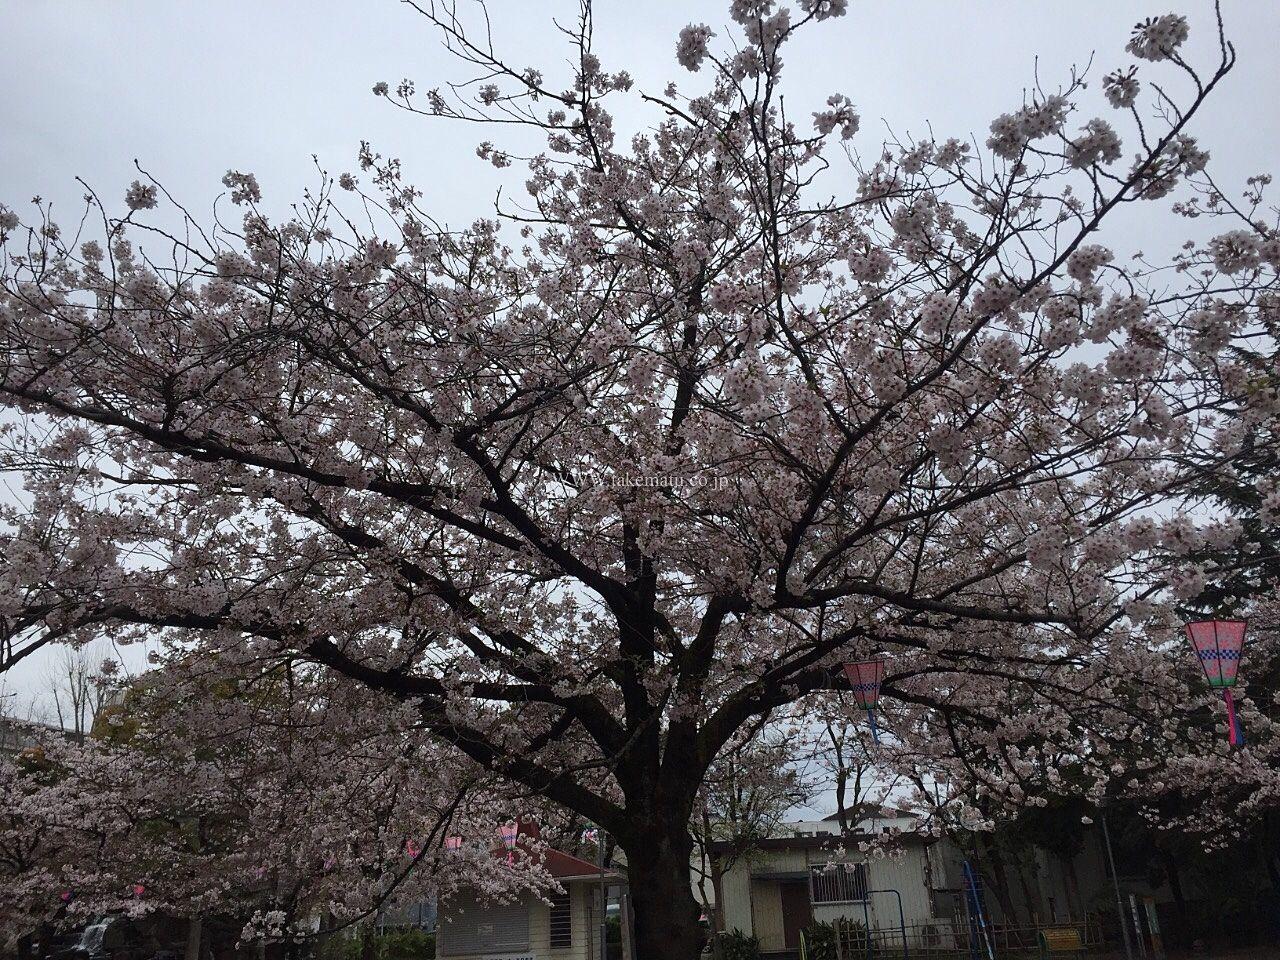 桜が見事な公園 江戸川区立 東小松川公園